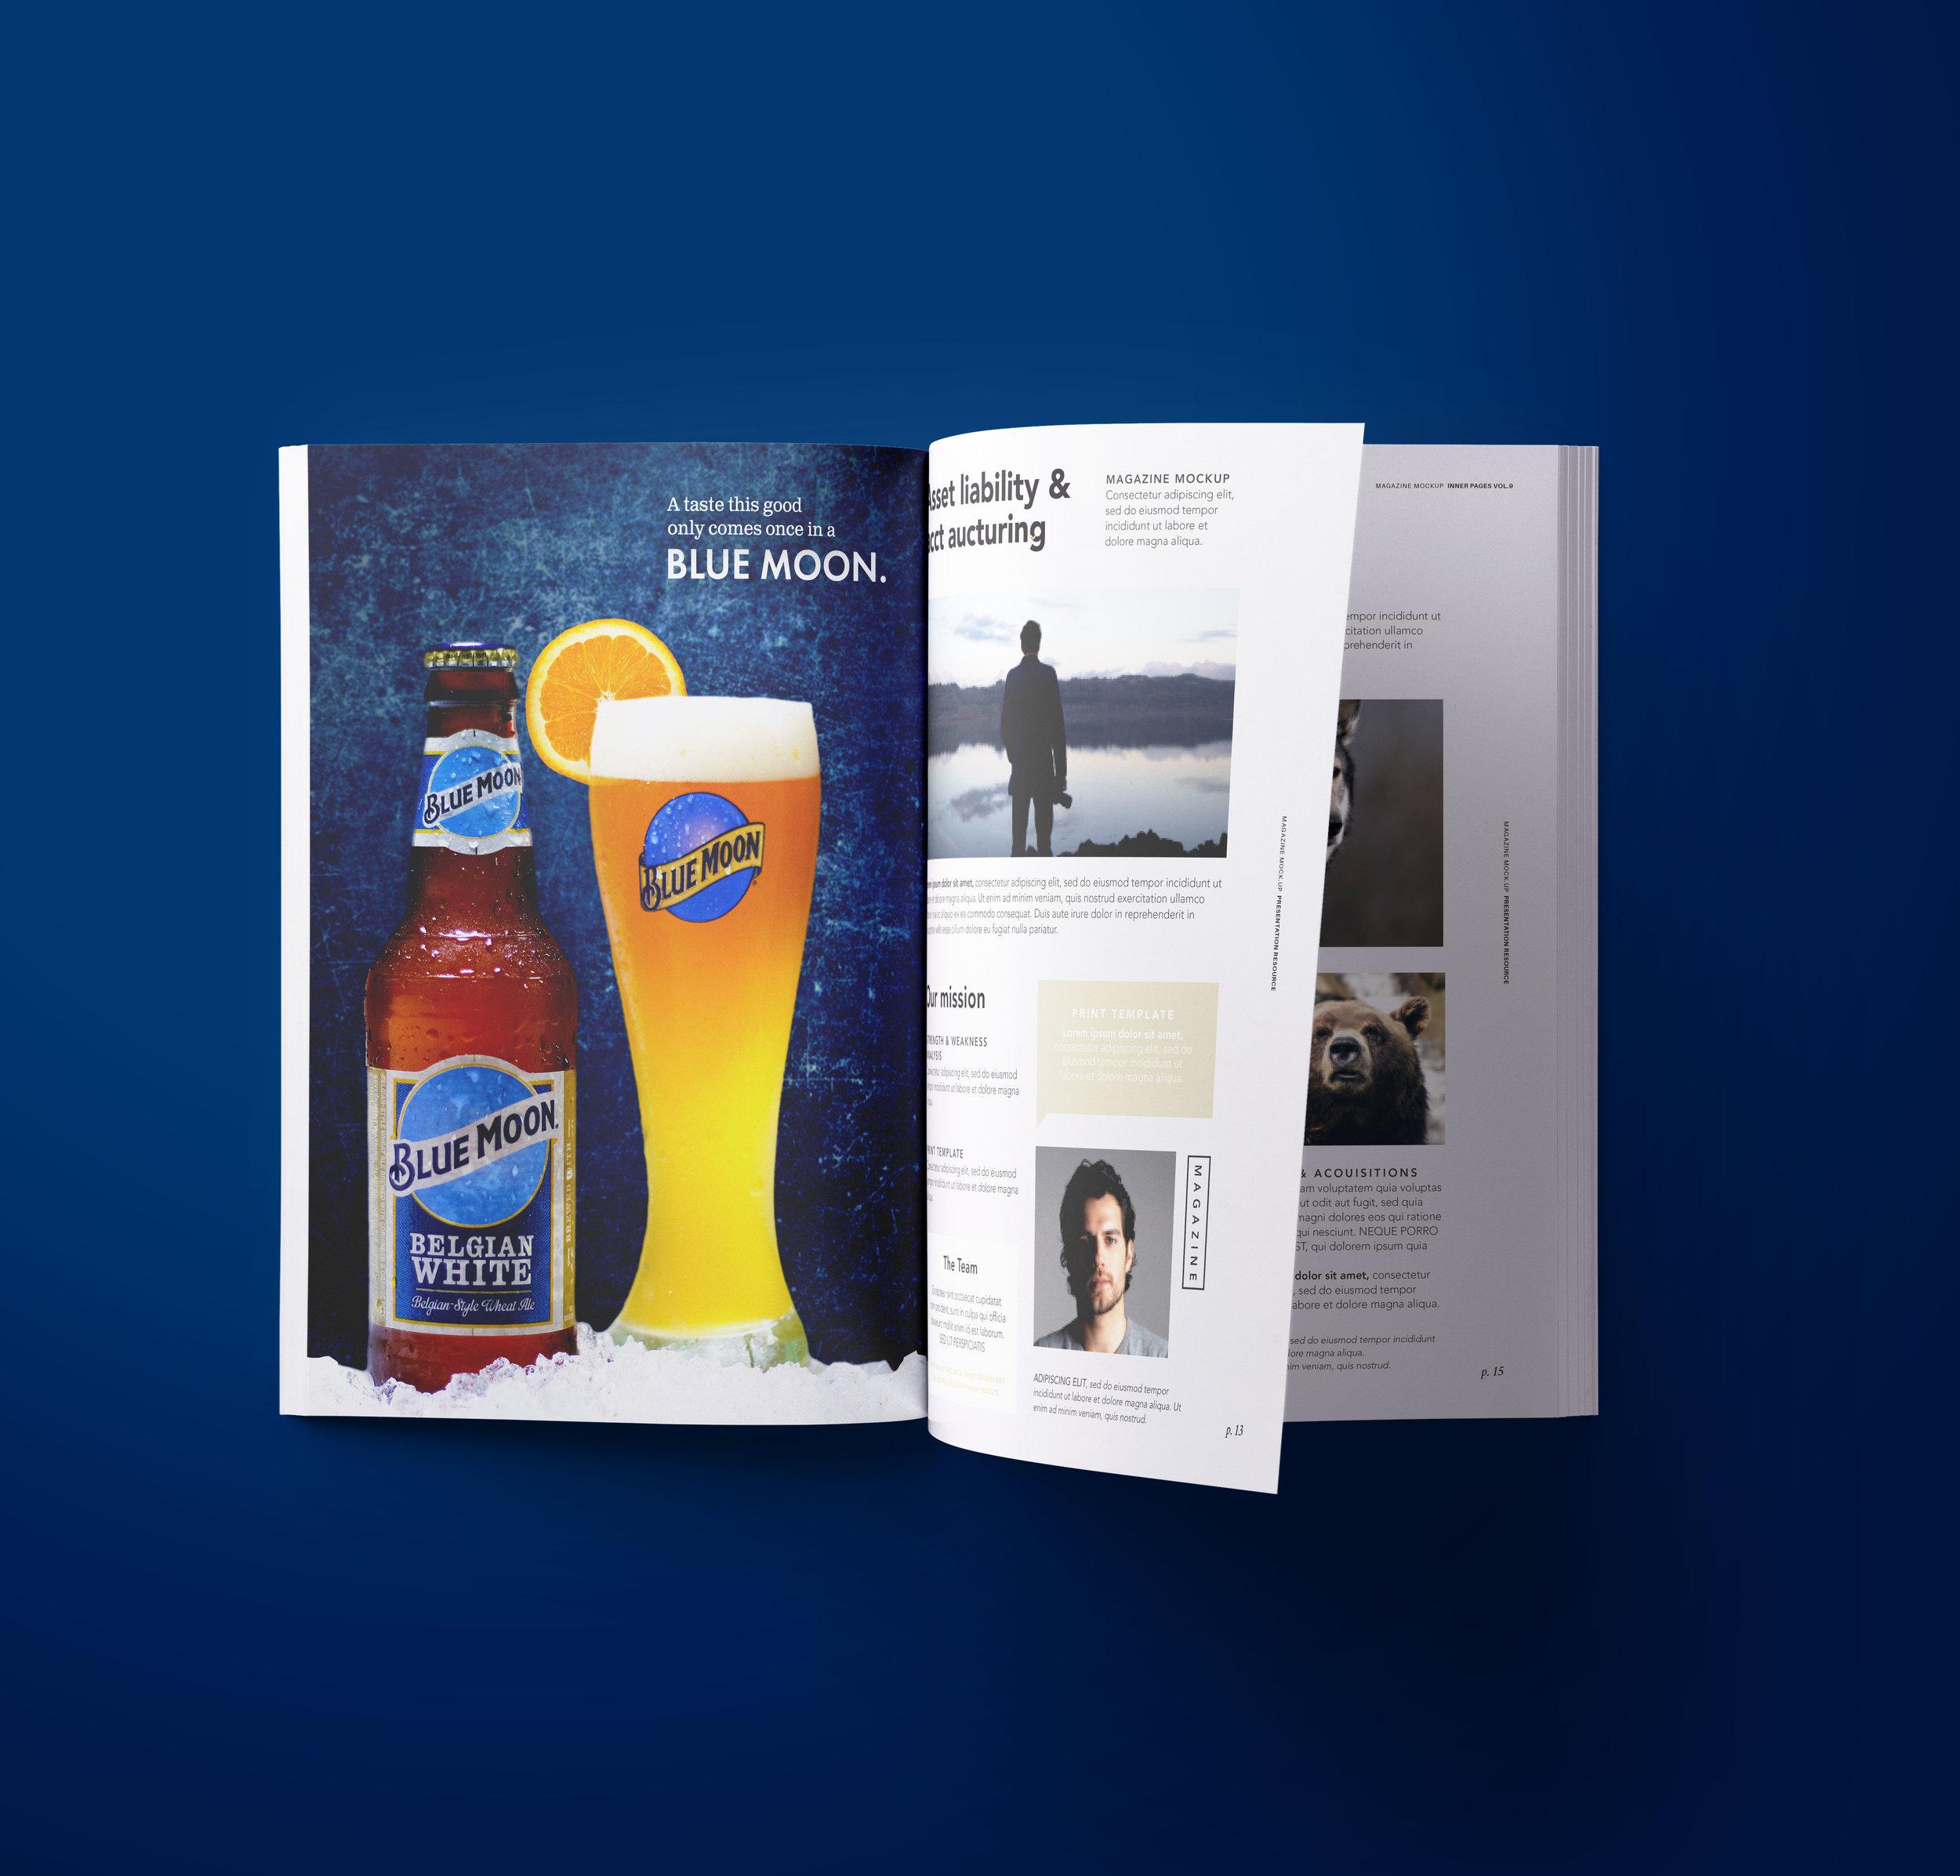 BlueMoon_MagazineAd.jpg